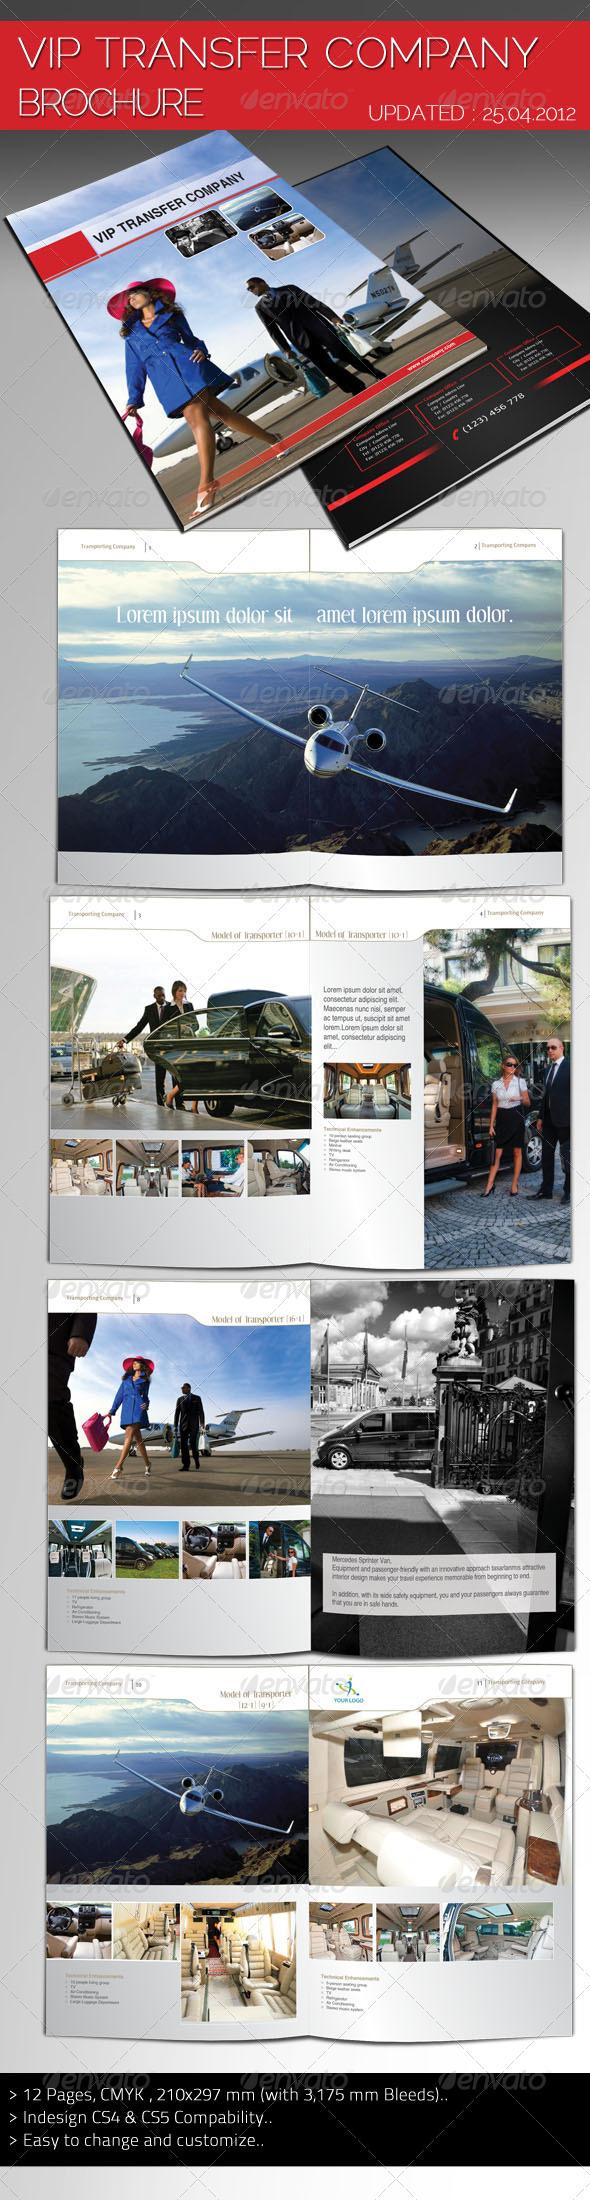 Vip Transfer Company Brochure - Corporate Brochures